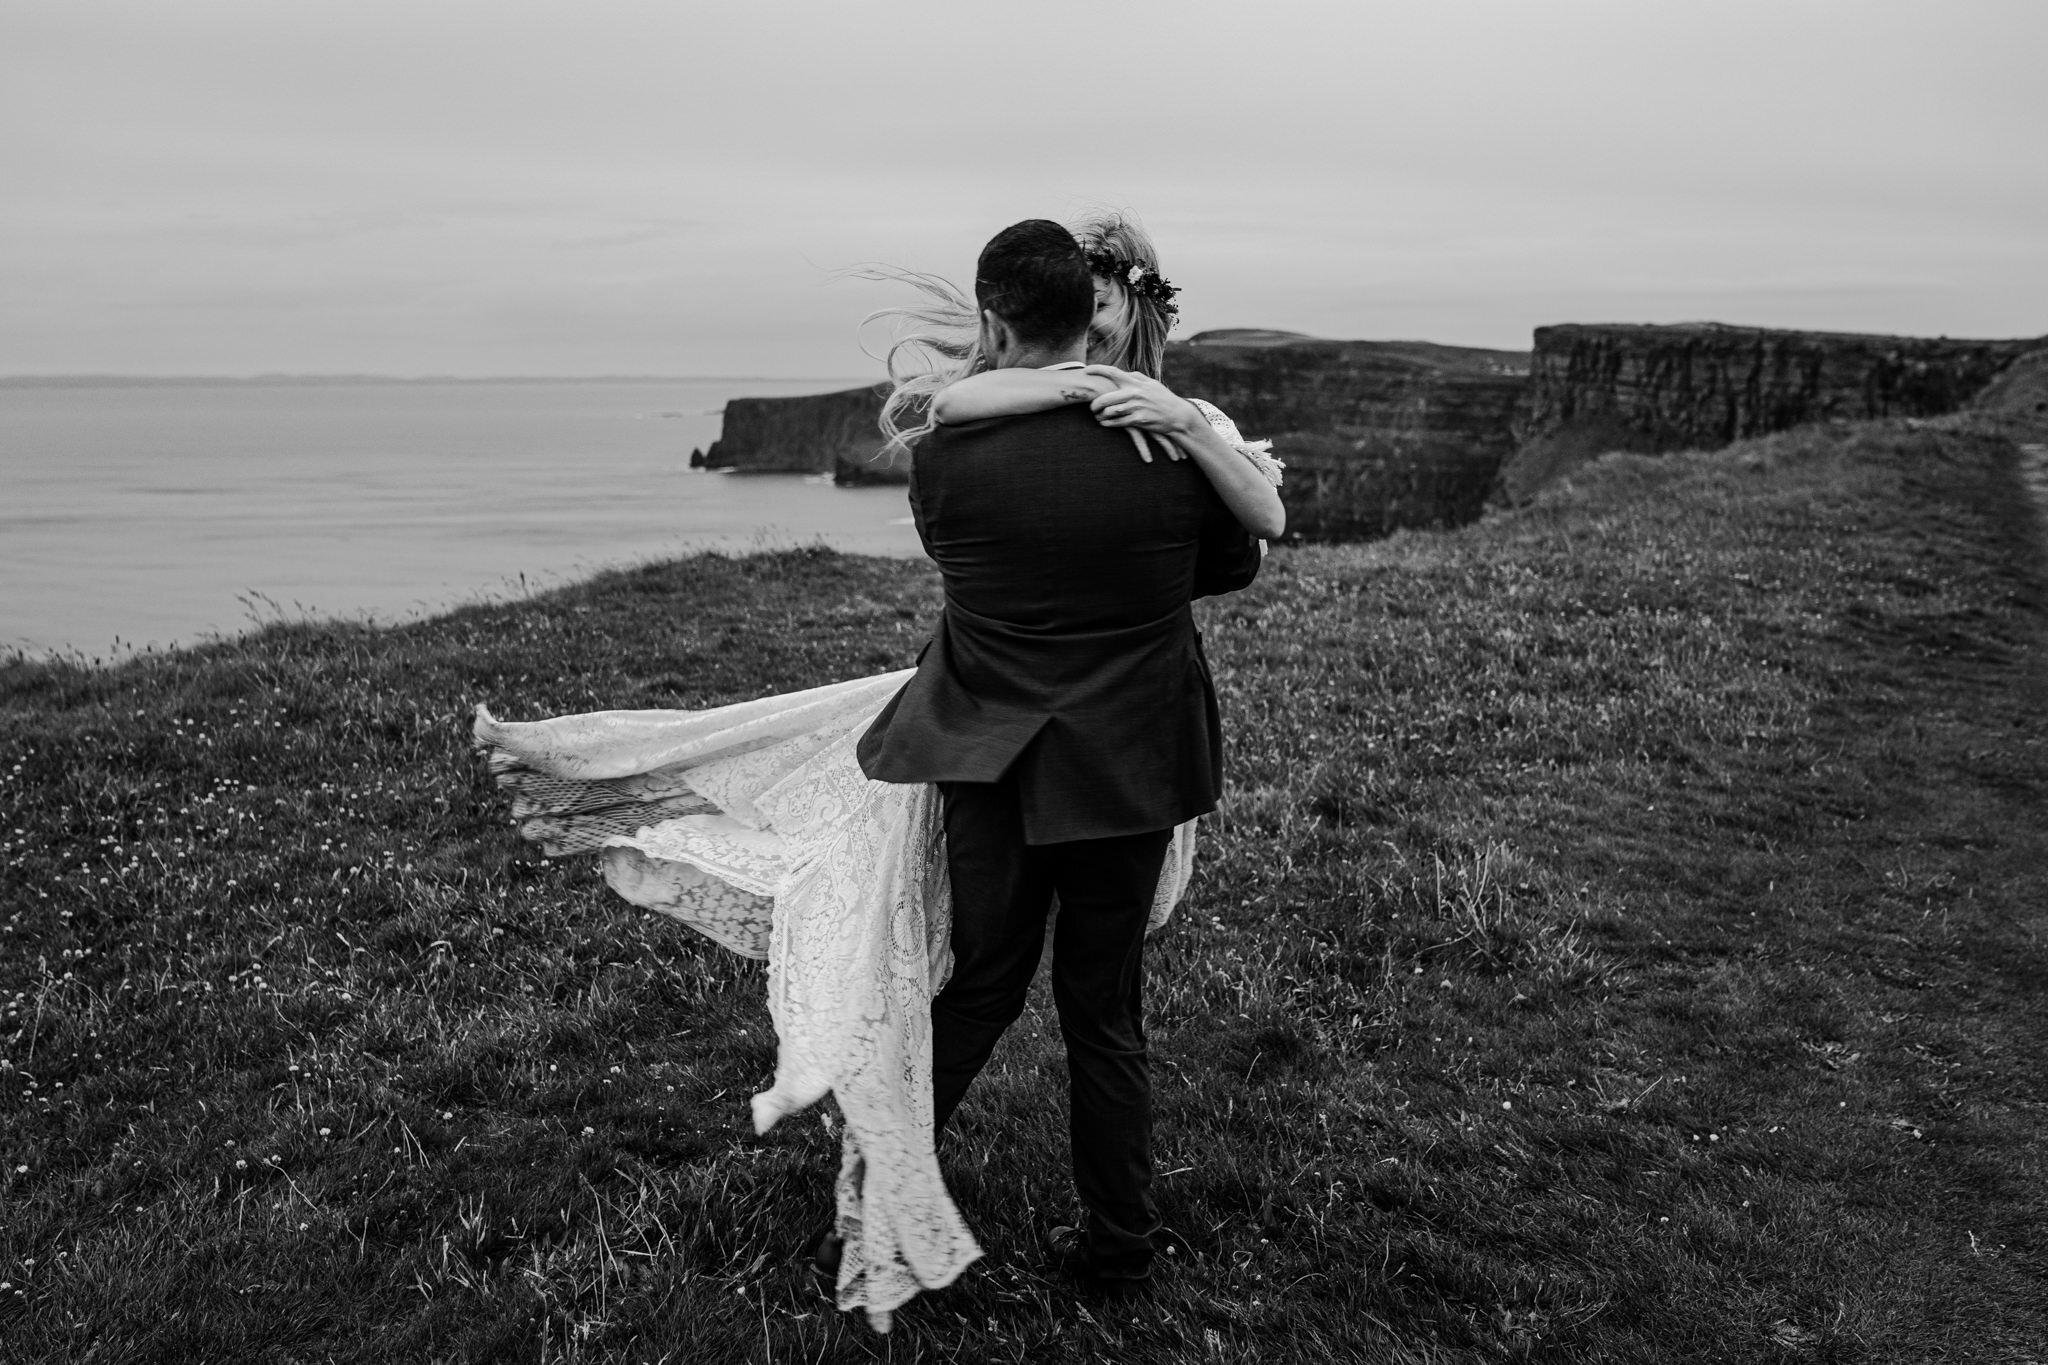 husband spins wife on cliffs edge Cliffs of Moher ireland